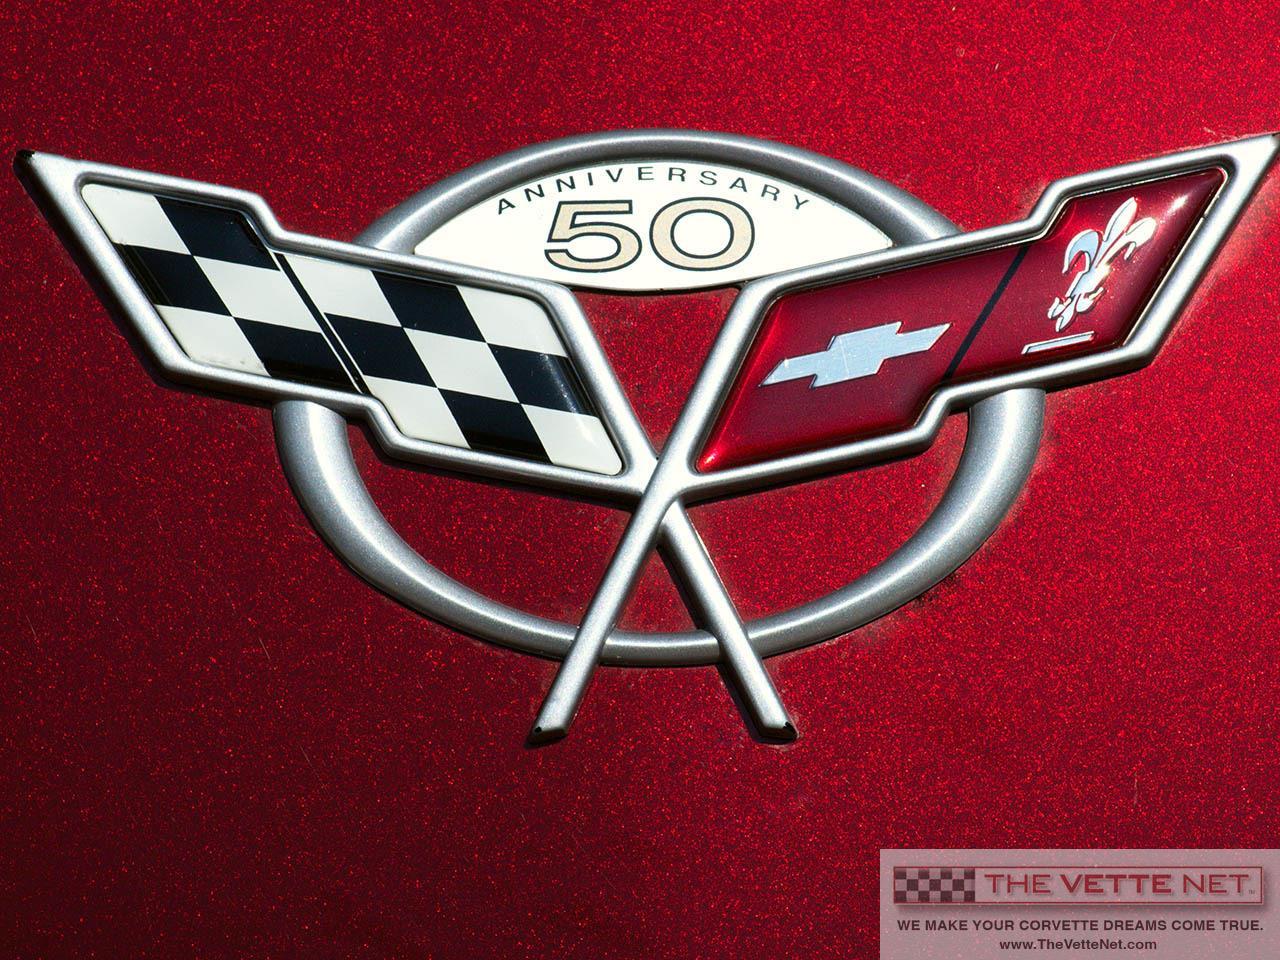 Large Picture of 2003 Chevrolet Corvette - $31,990.00 - I62B